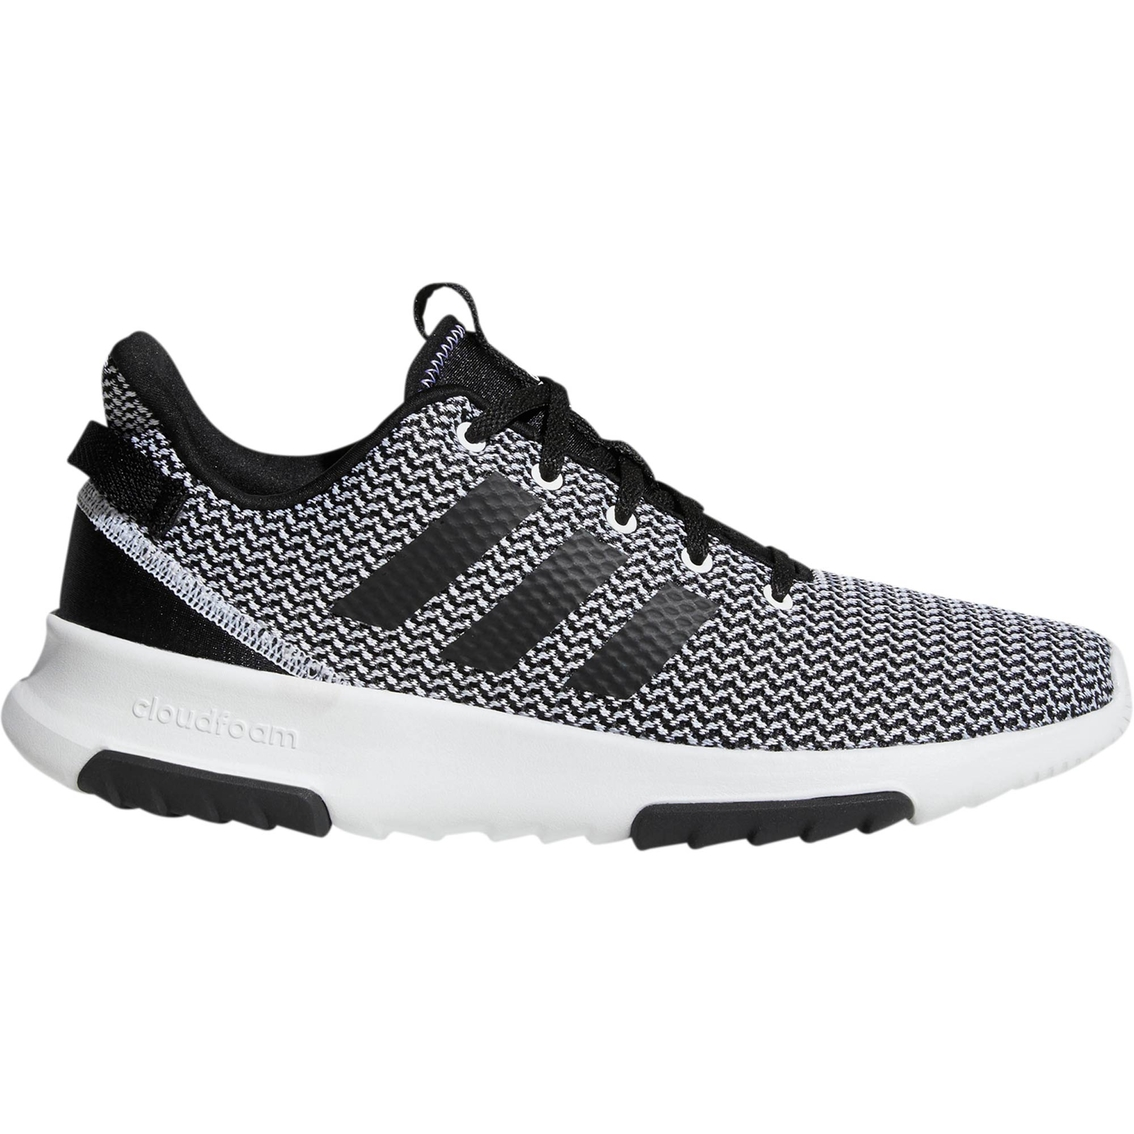 Neo Exchange: Adidas Neo Men's Cloudfoam Racer Tr Running Shoes